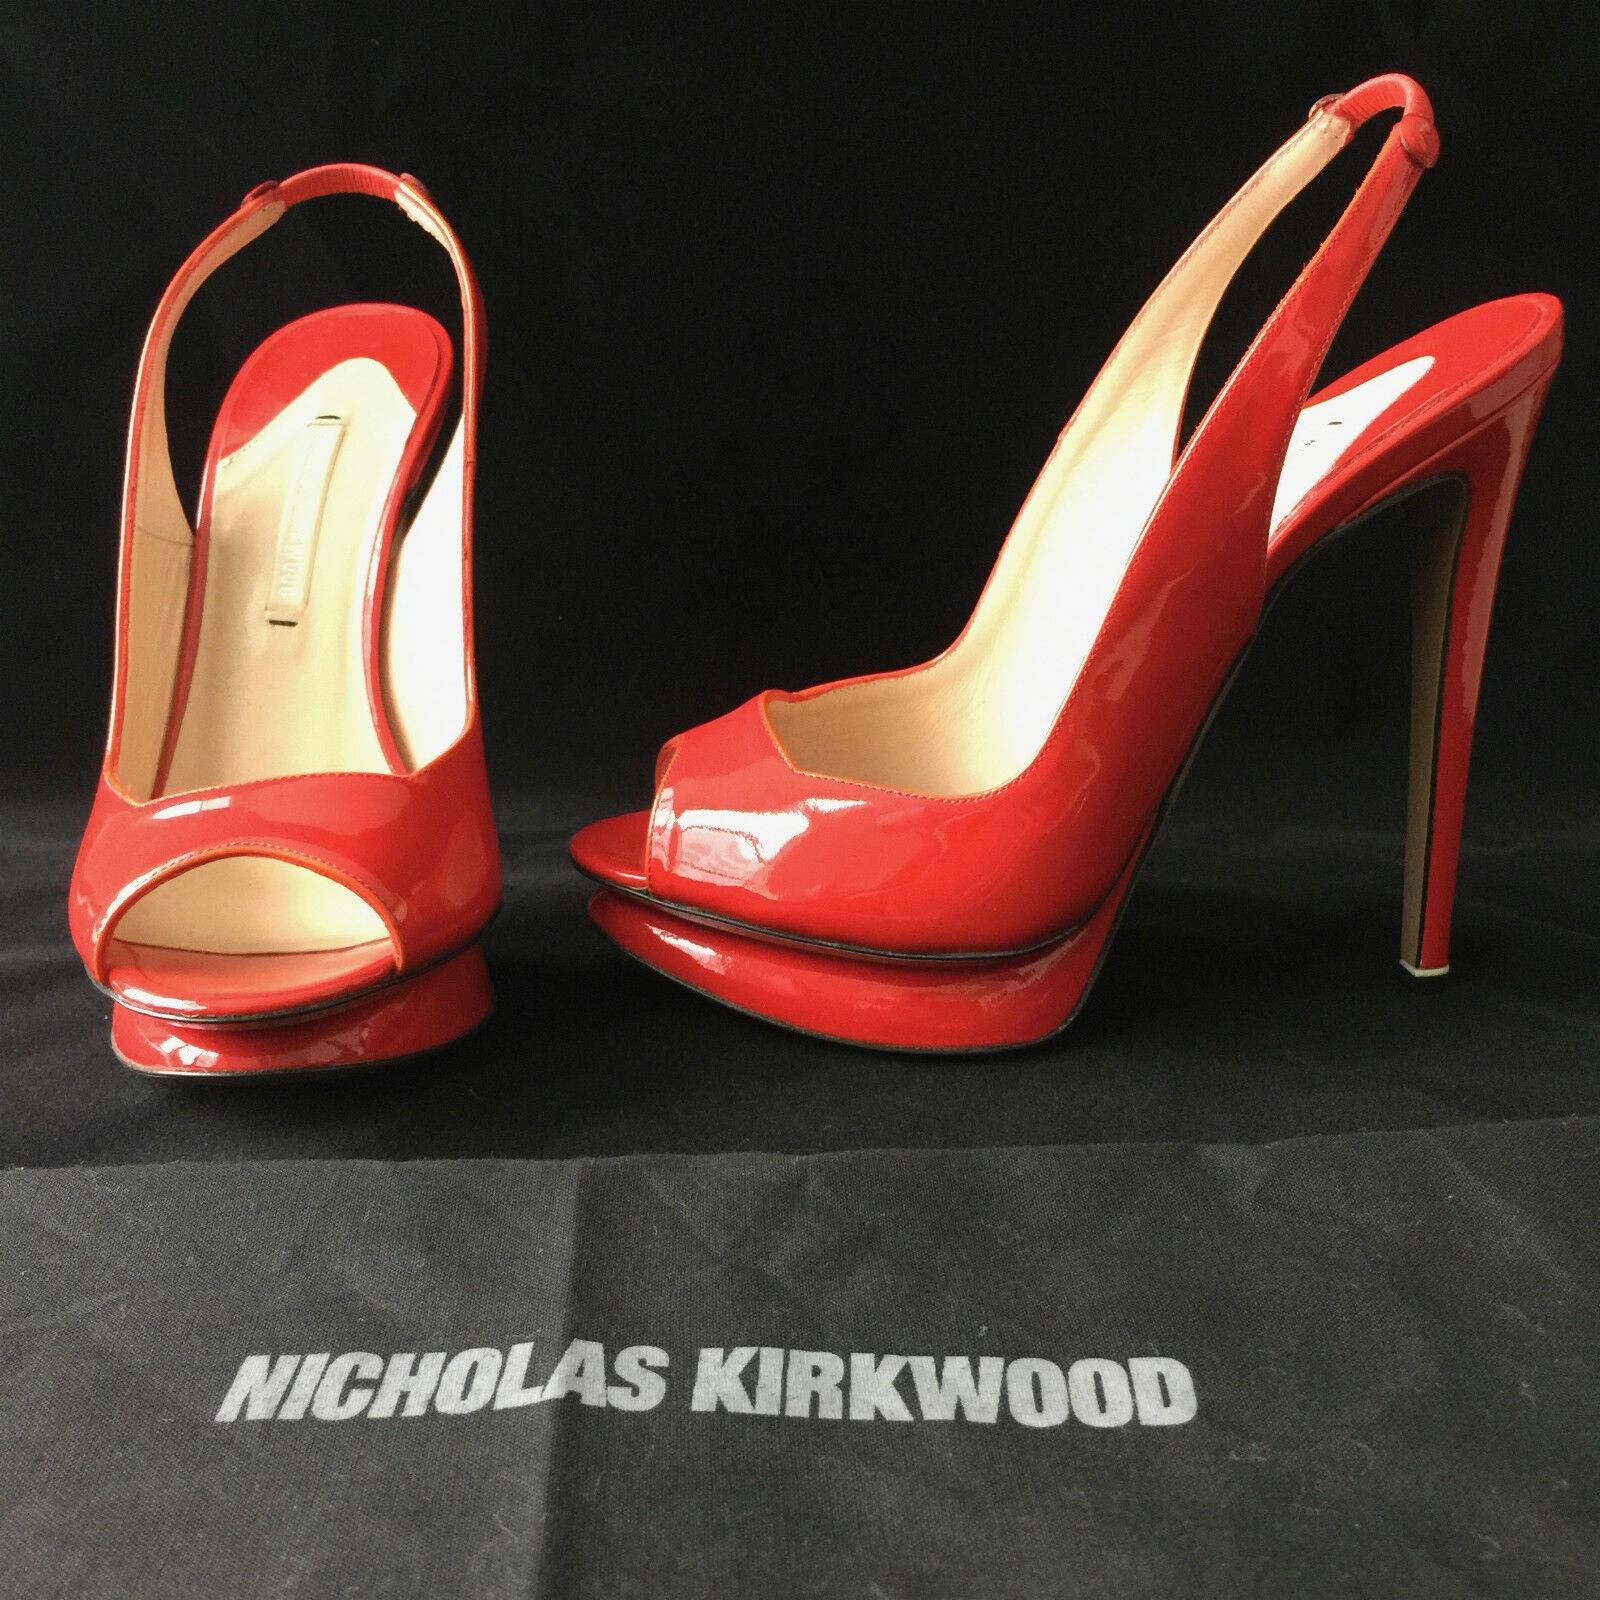 NEW NICHOLAS KIRKWOOD LIPSTICK rot PATENT SLINGBACK PLATFORM HEELS PUMPS 36.5